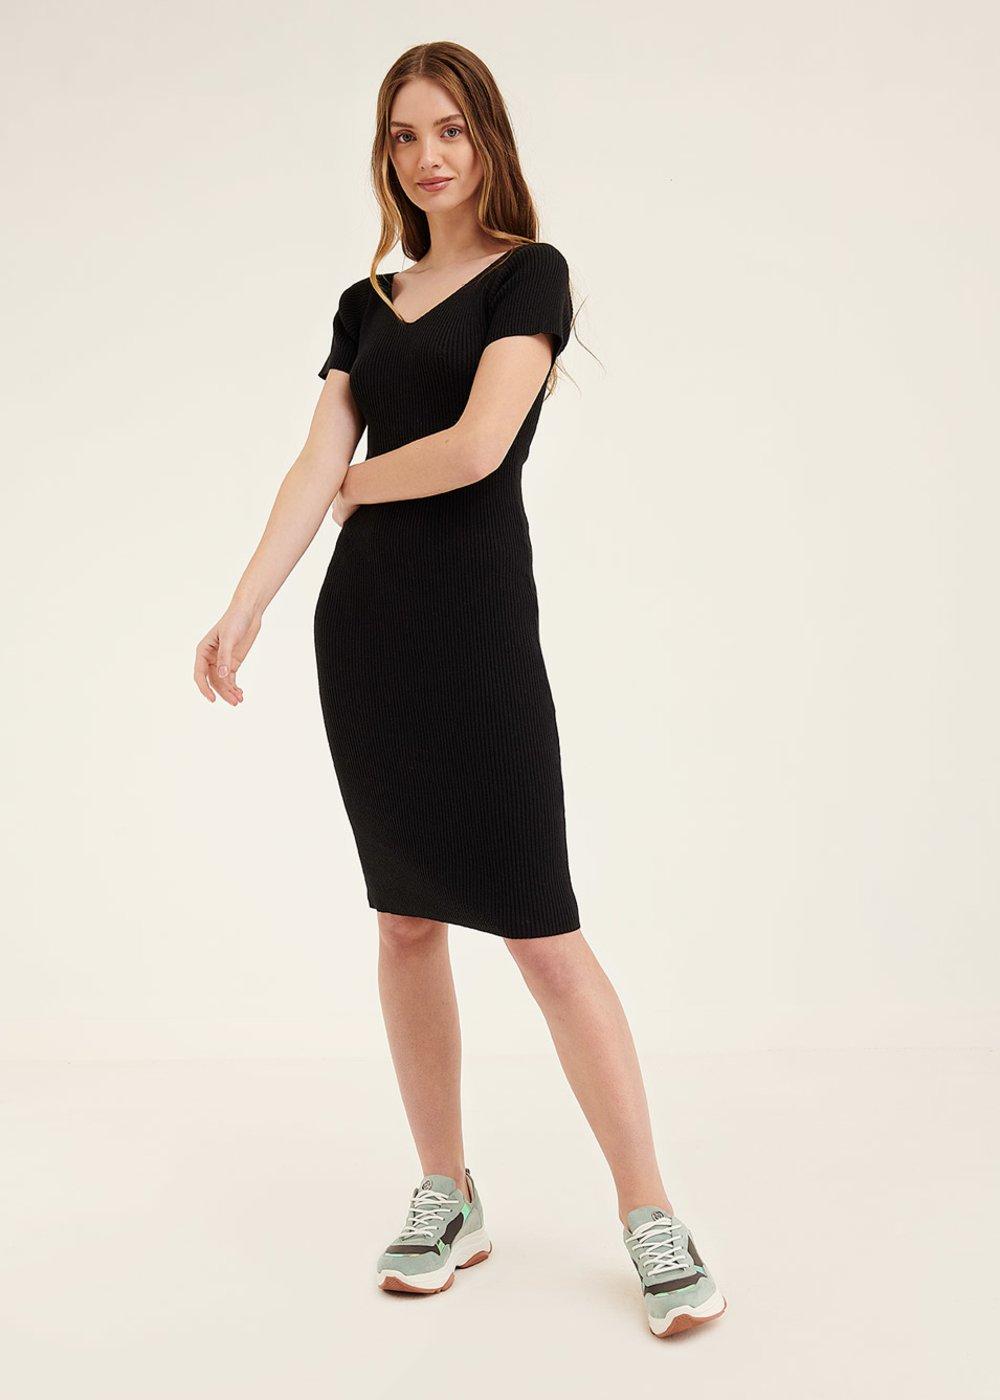 Adam sheath dress - Black - Woman